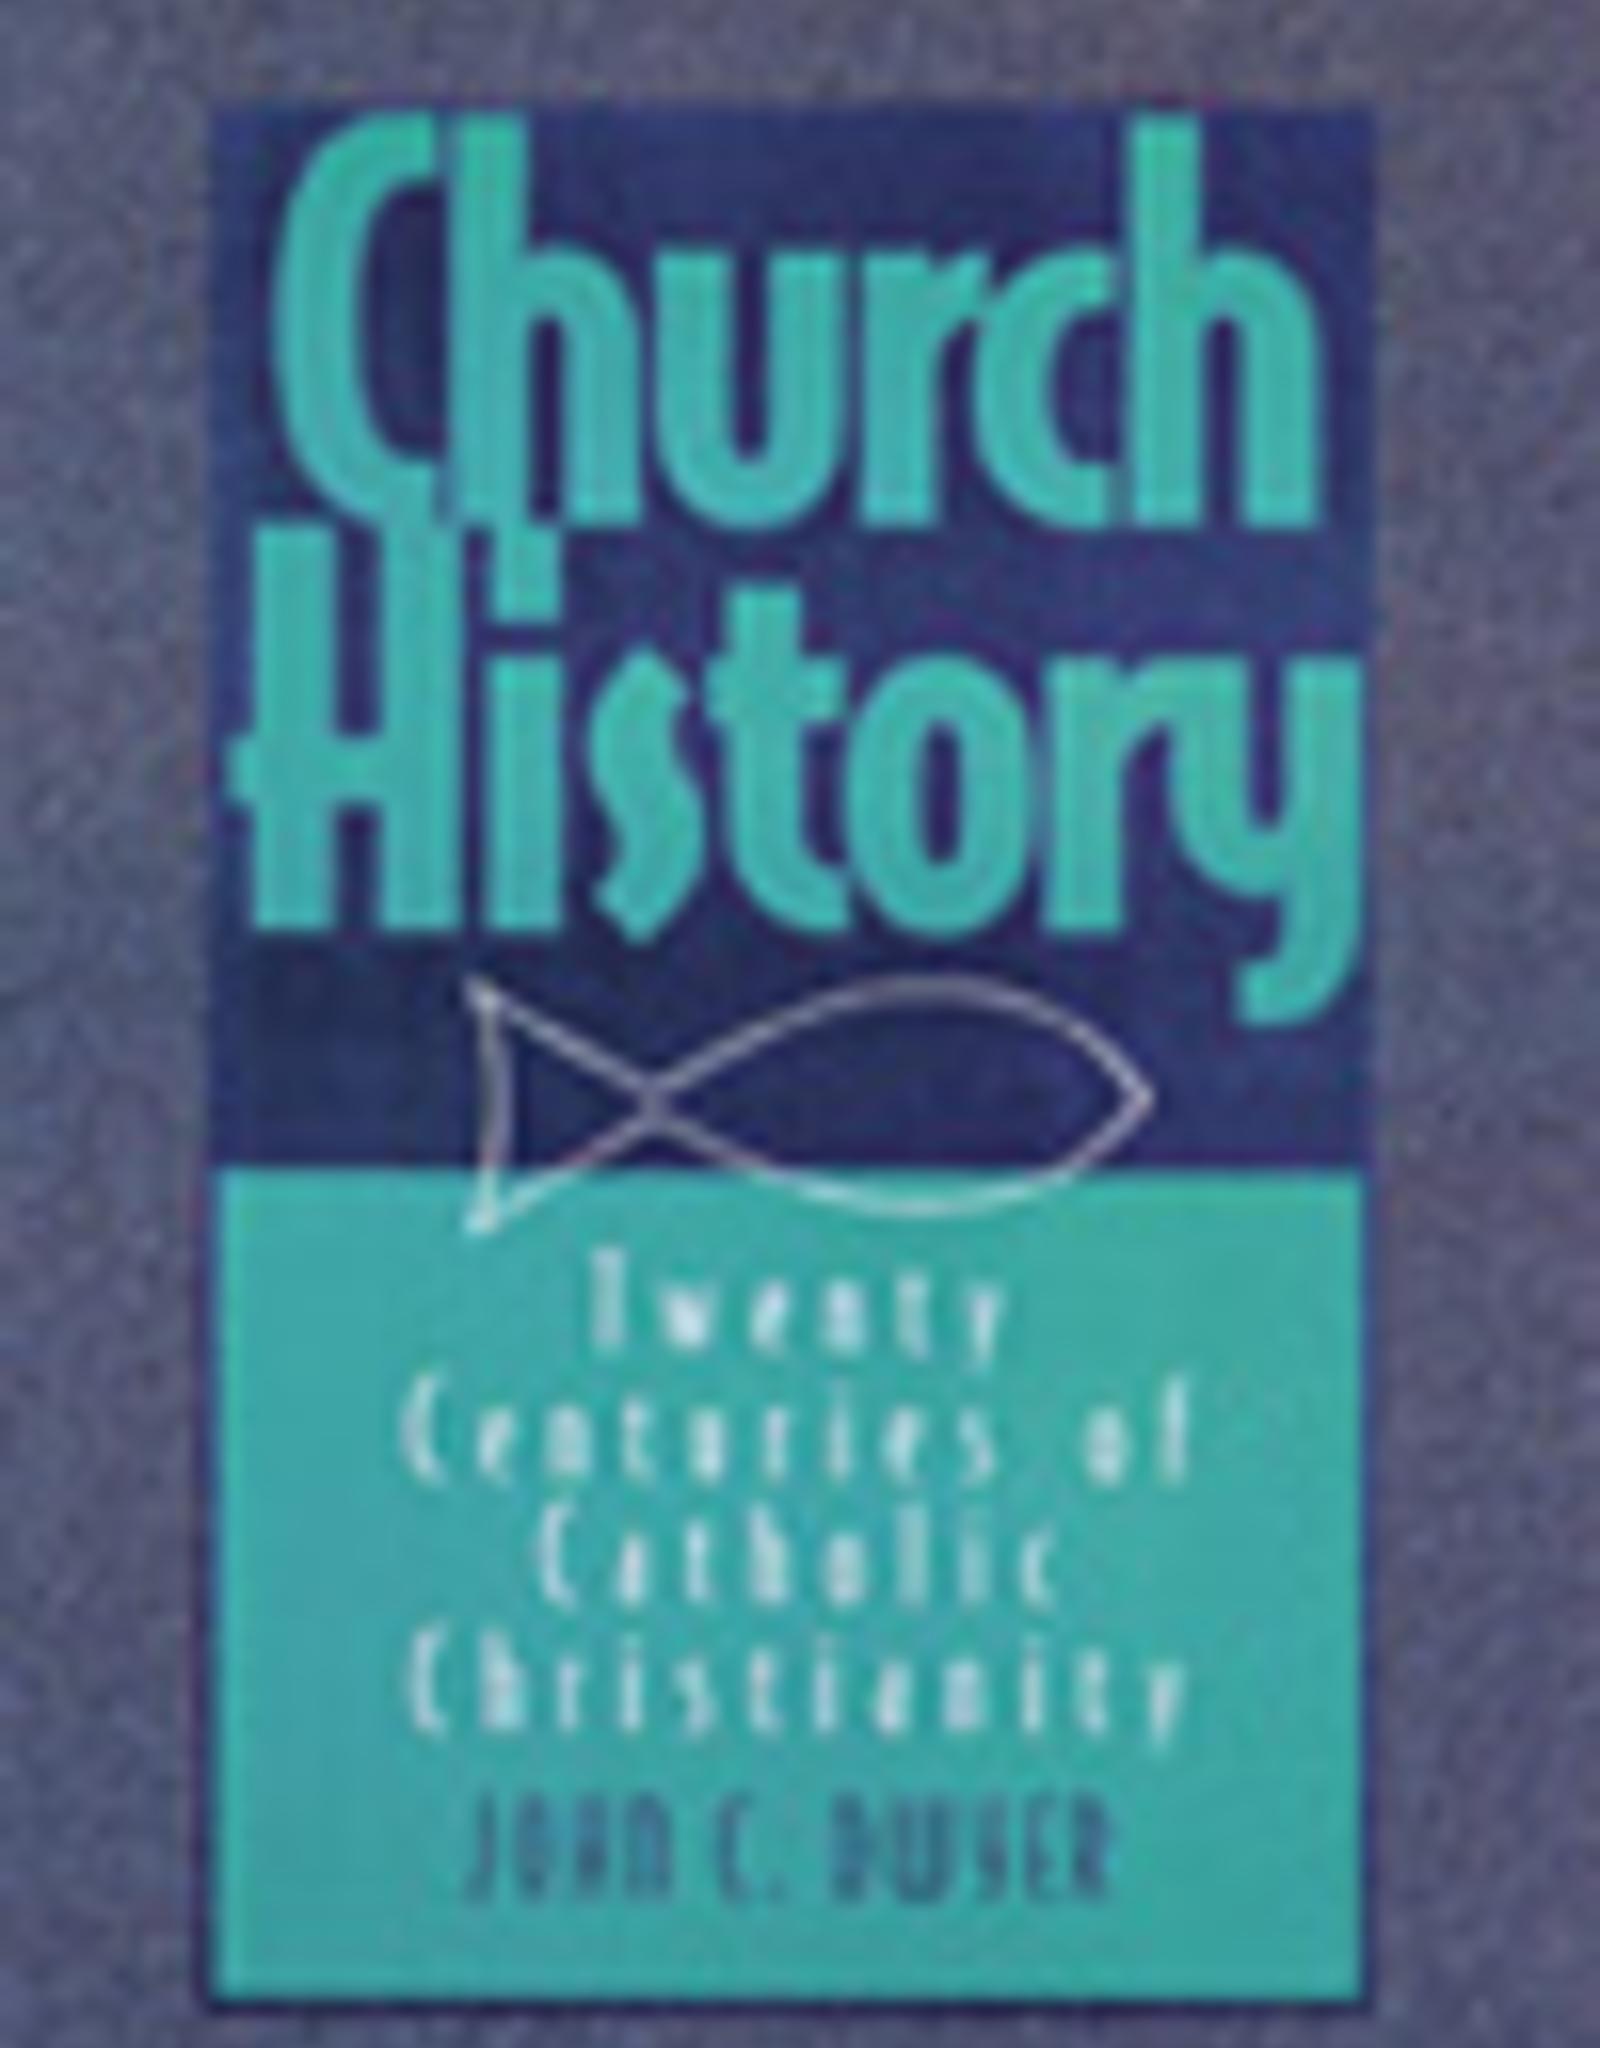 Paulist Press Church Hiustory:  Twenty Centuries of Catholic Christianity (Revised and Updated), by John Dwyer (paperback)